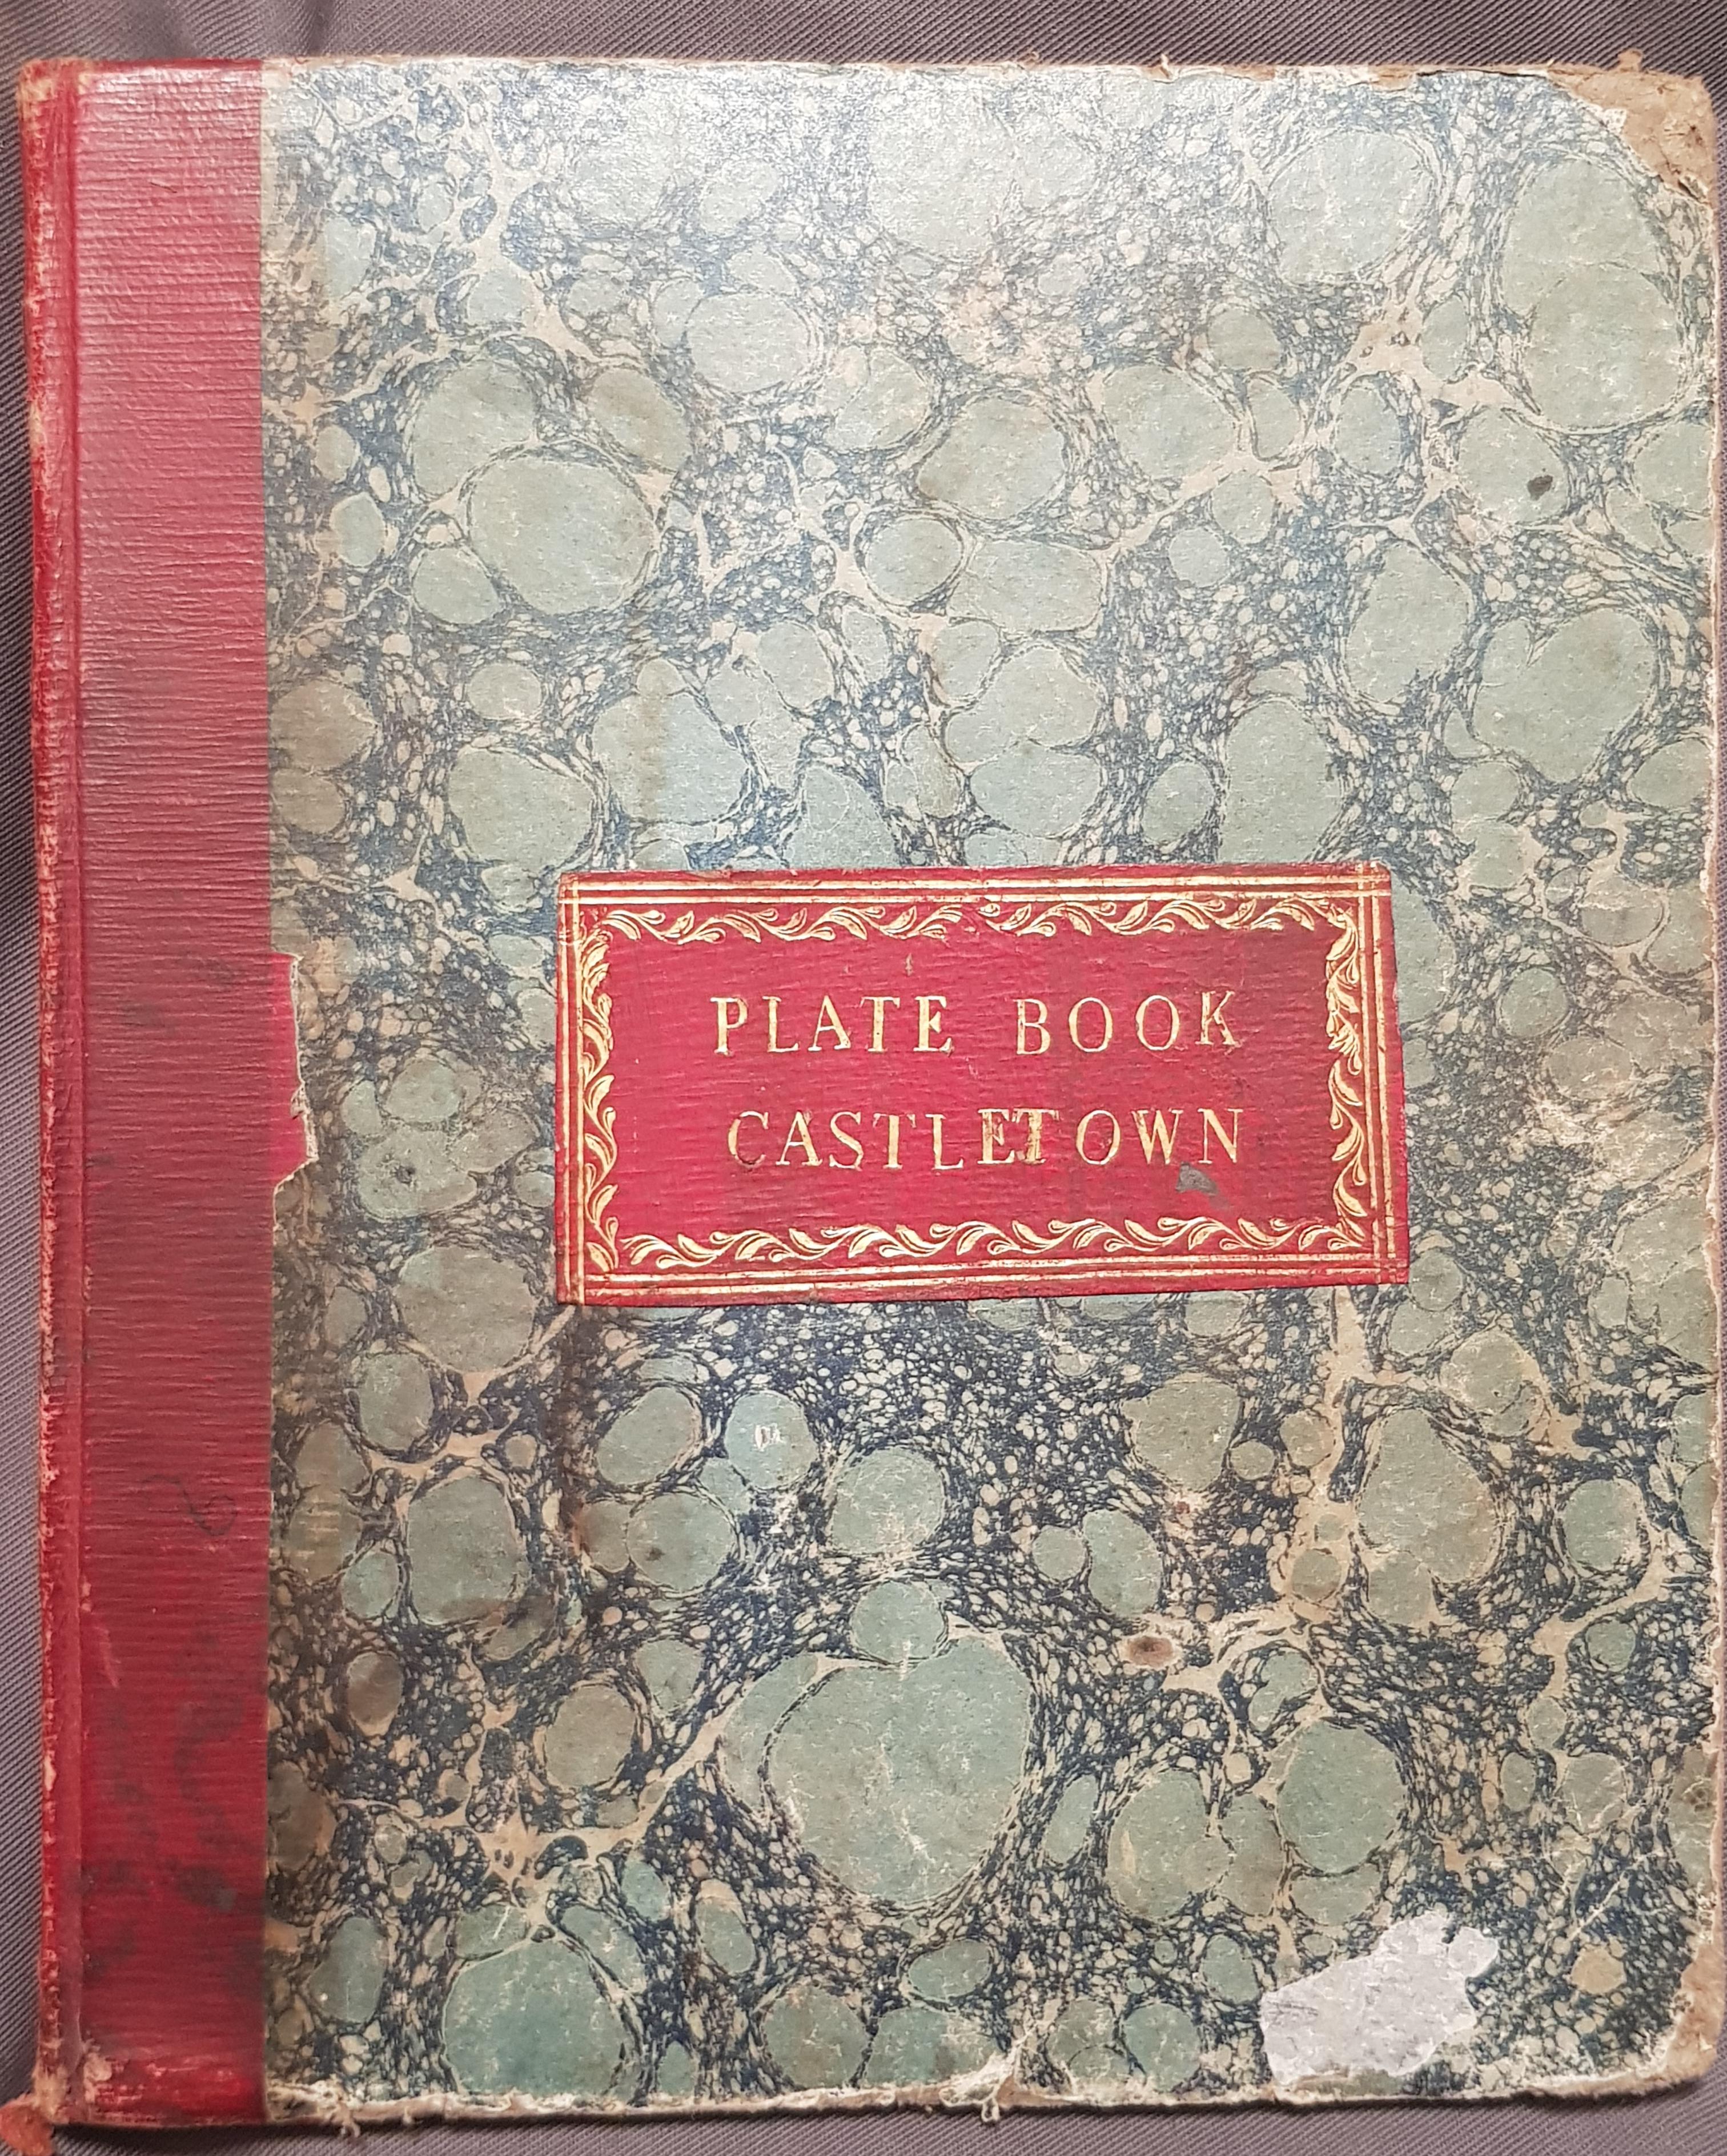 Plate Book Castletown